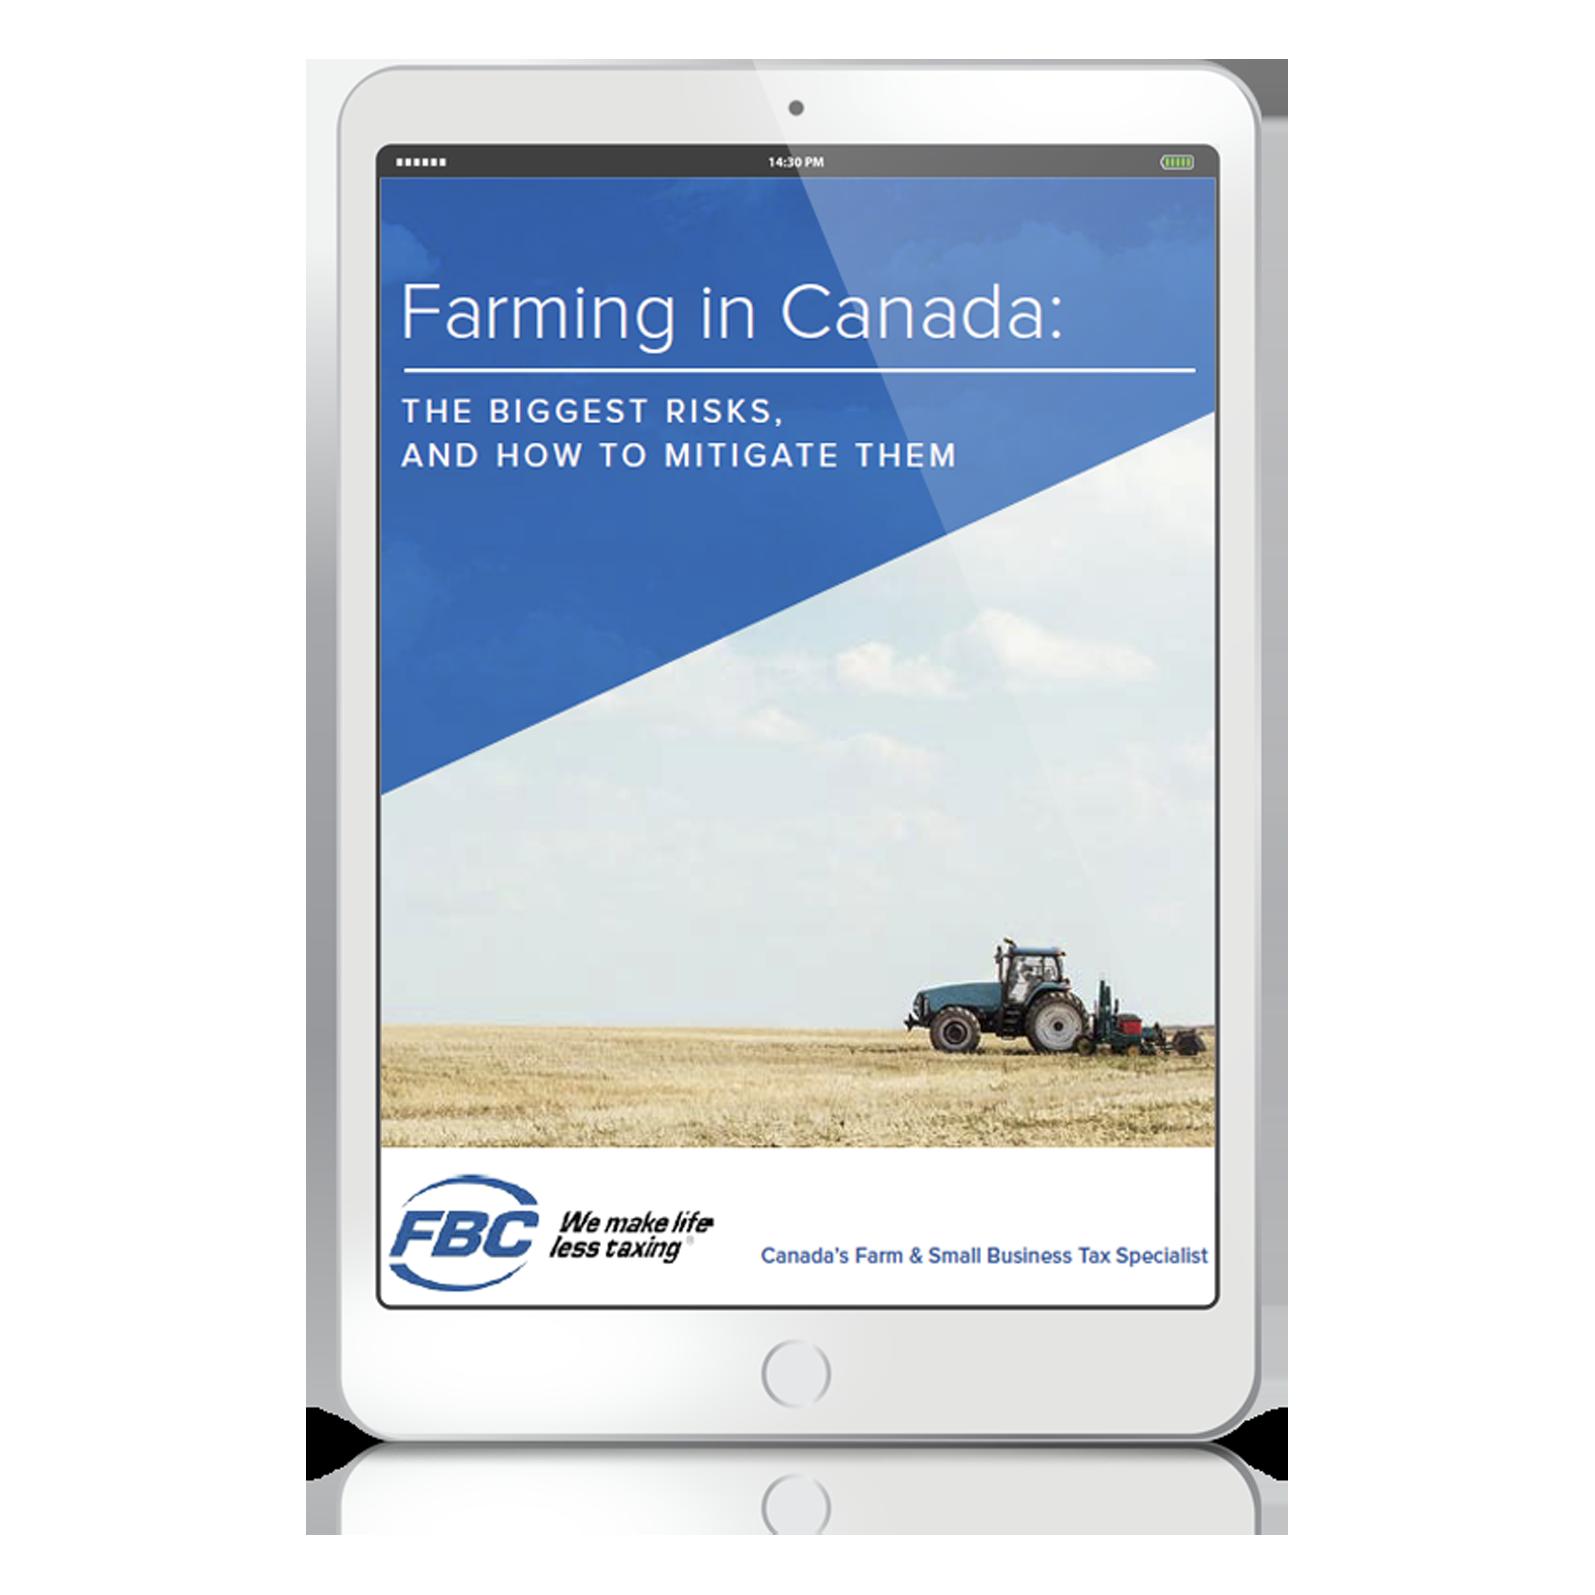 The Biggest Farming Risks in Canada